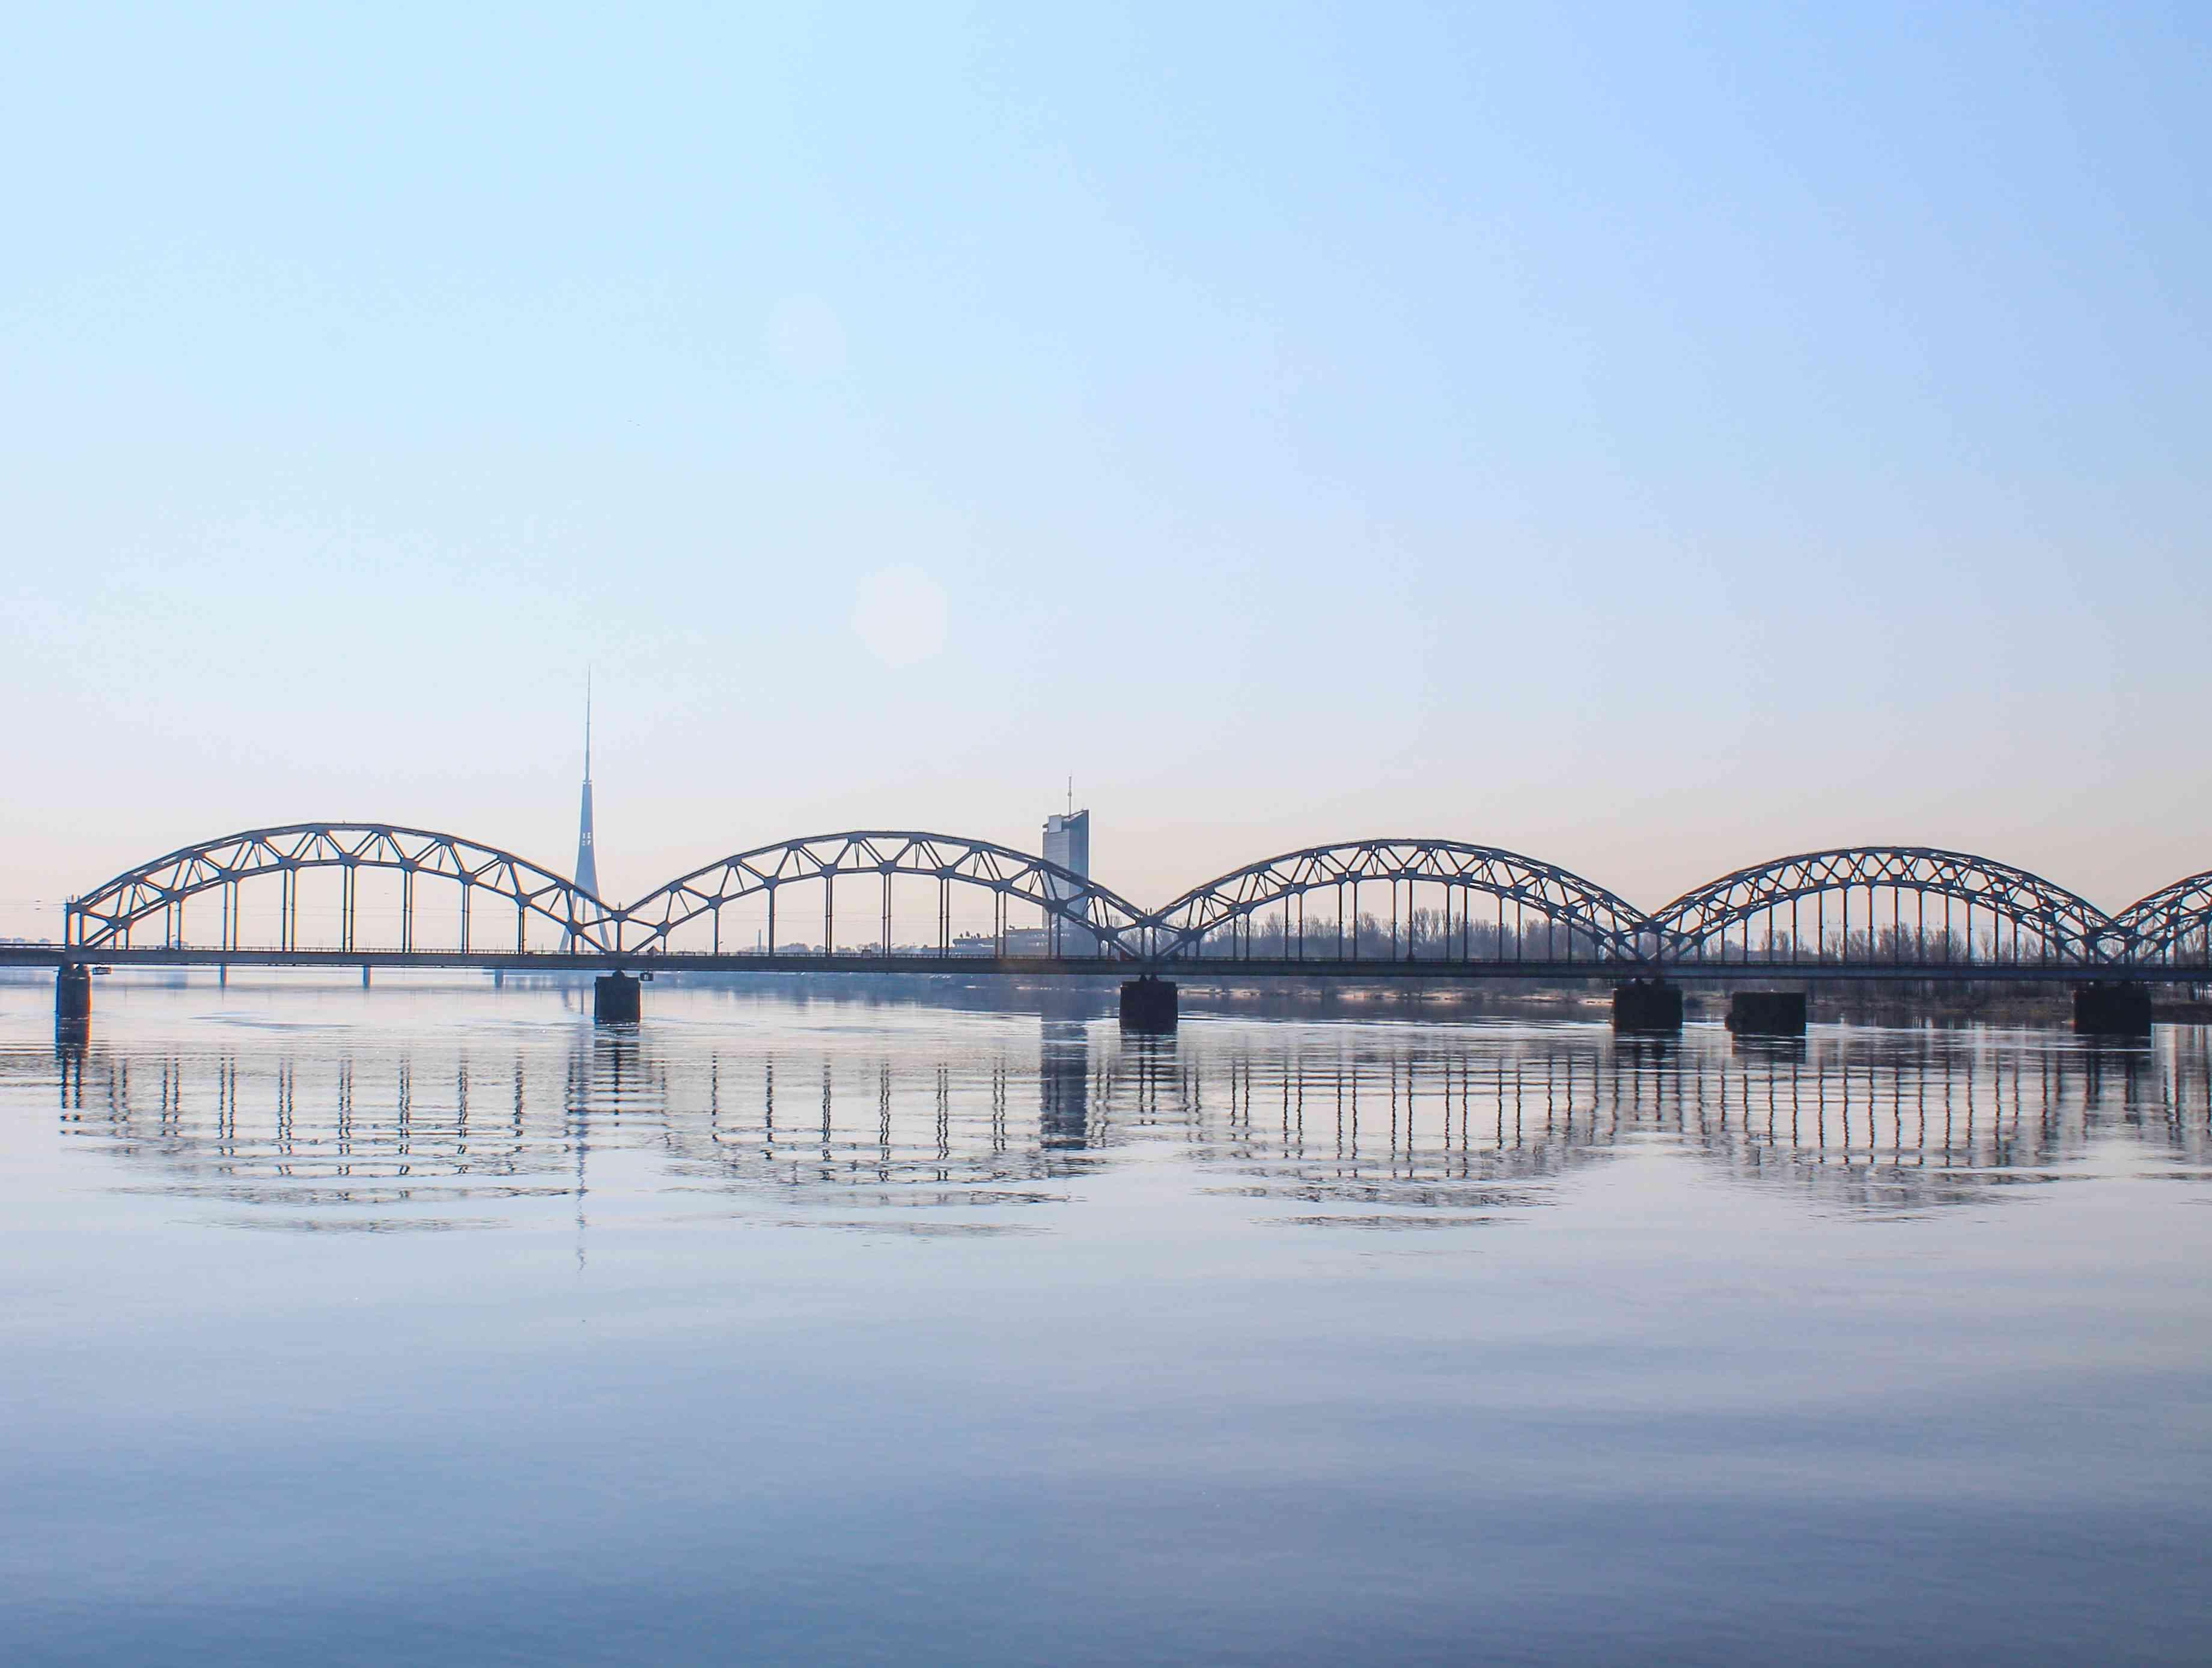 the bridge that crosses the water in Riga